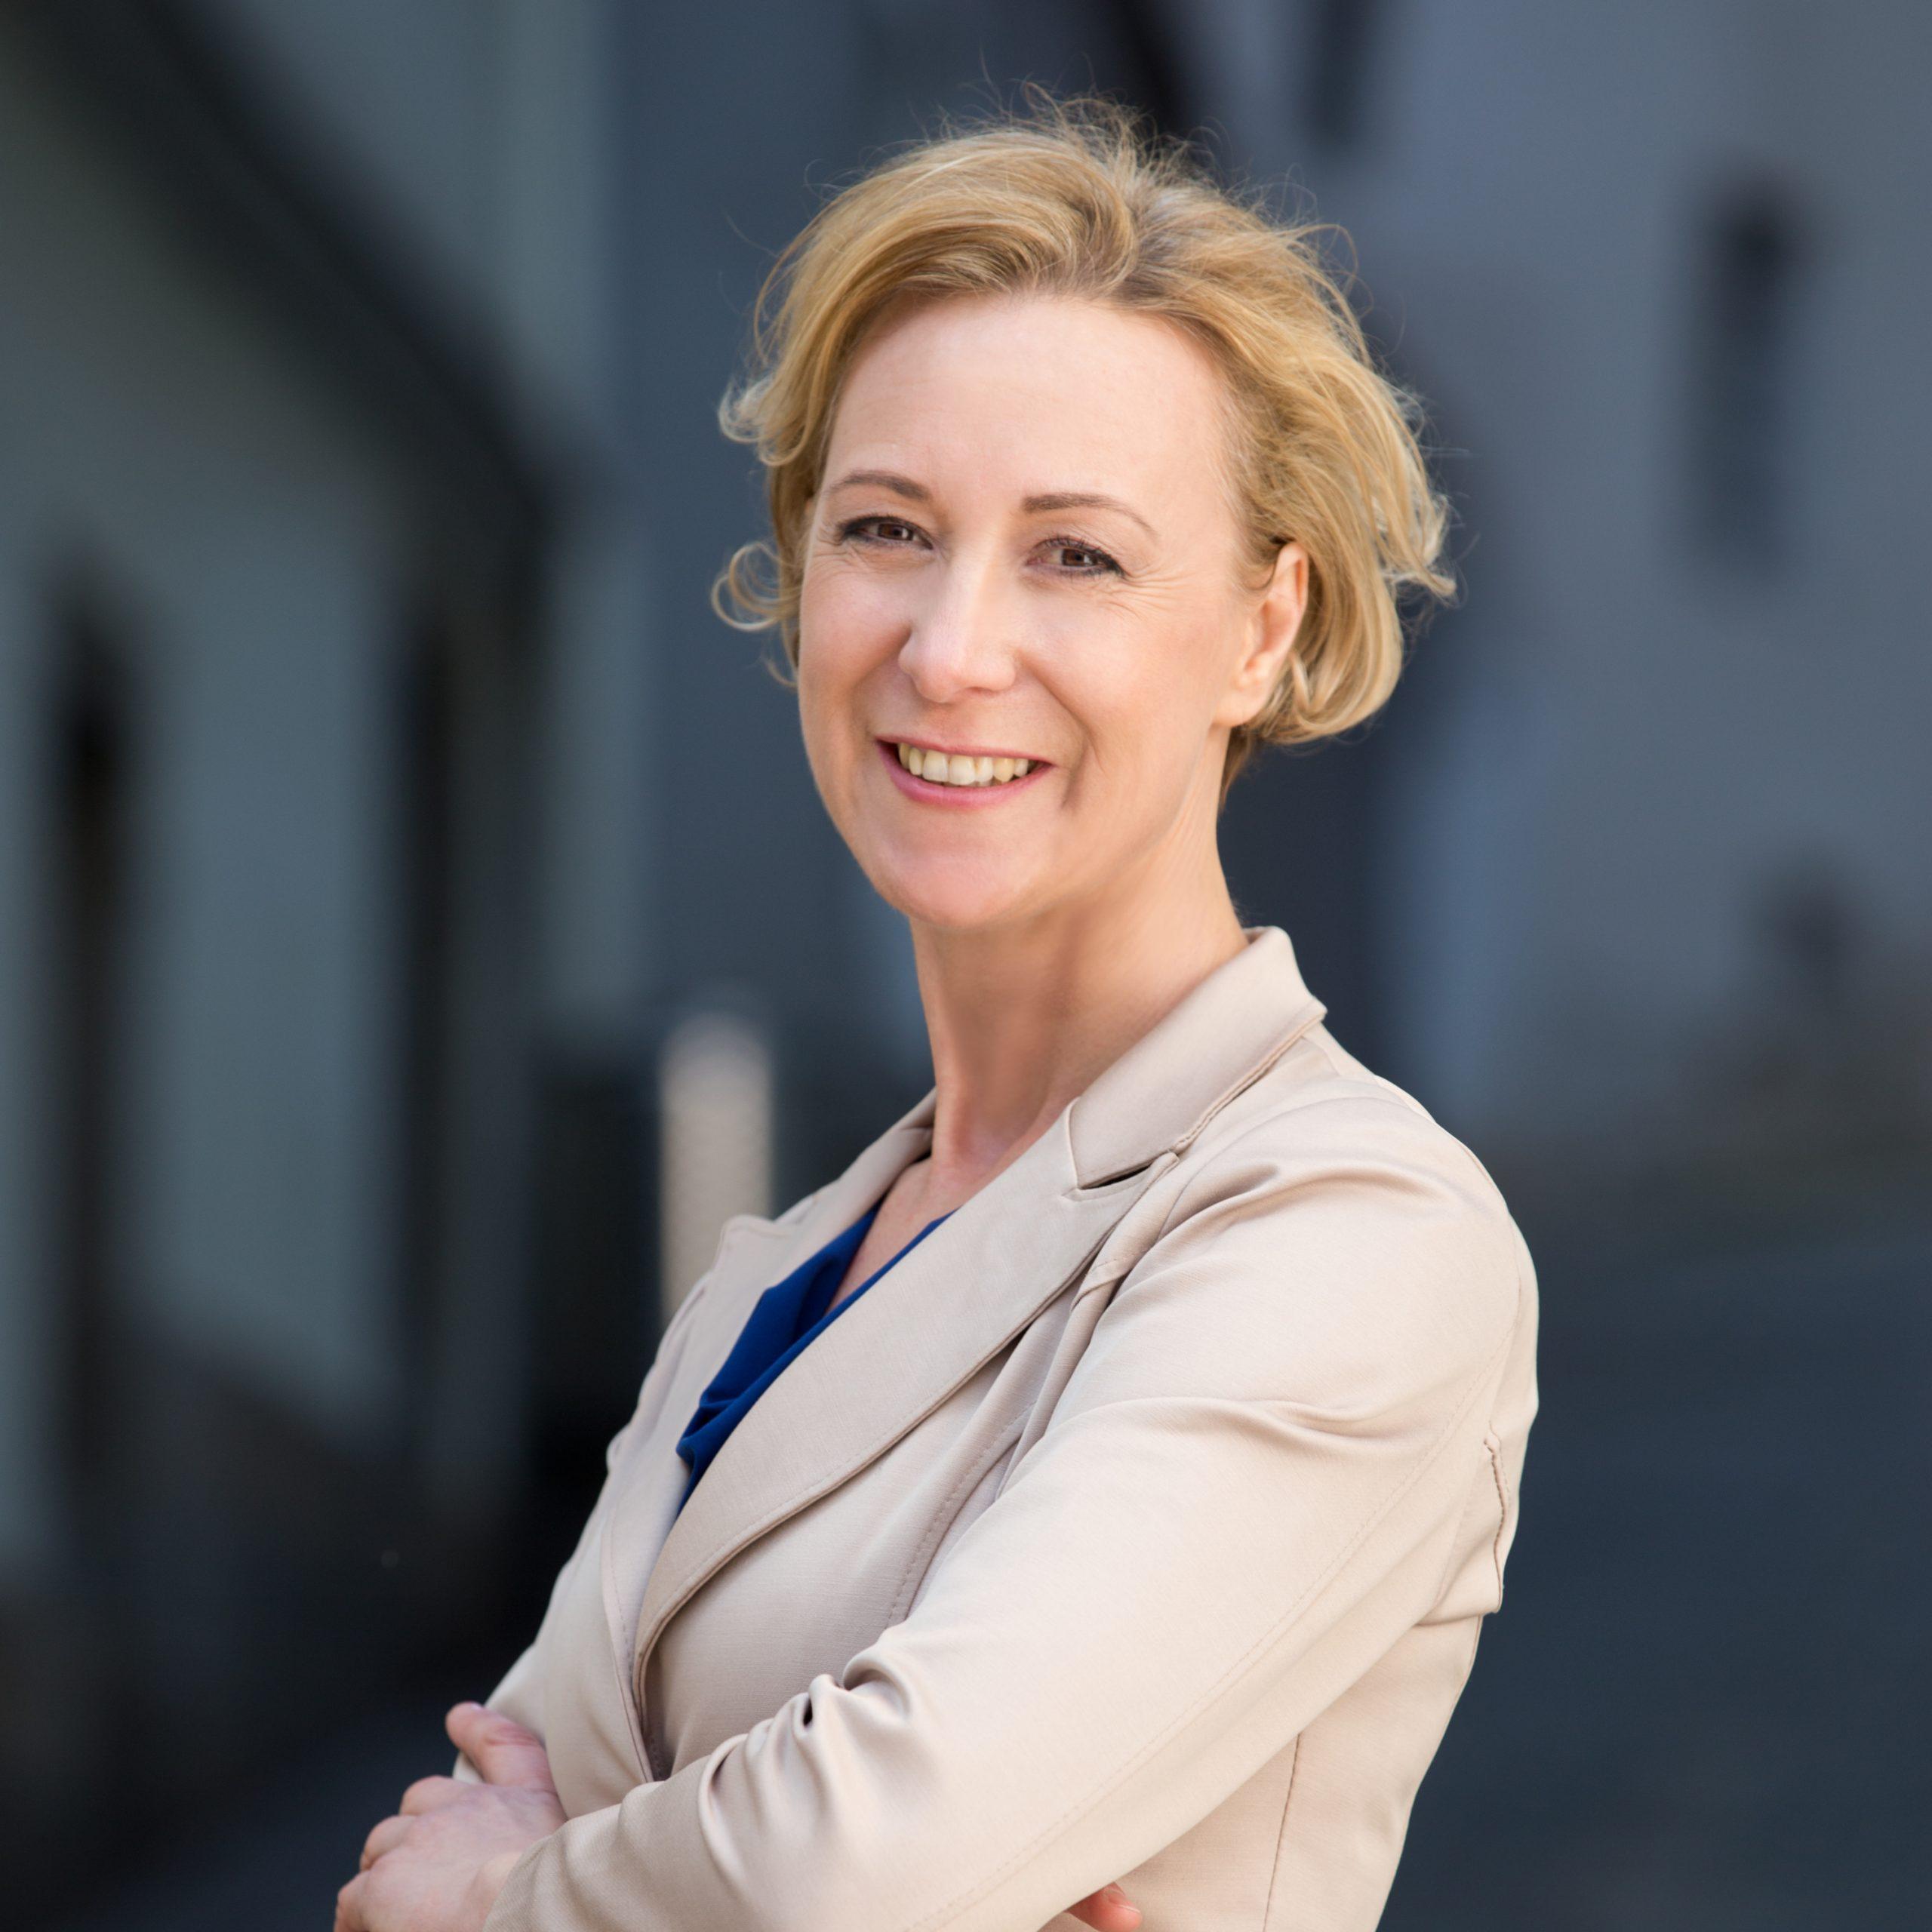 Regina Wengenroth